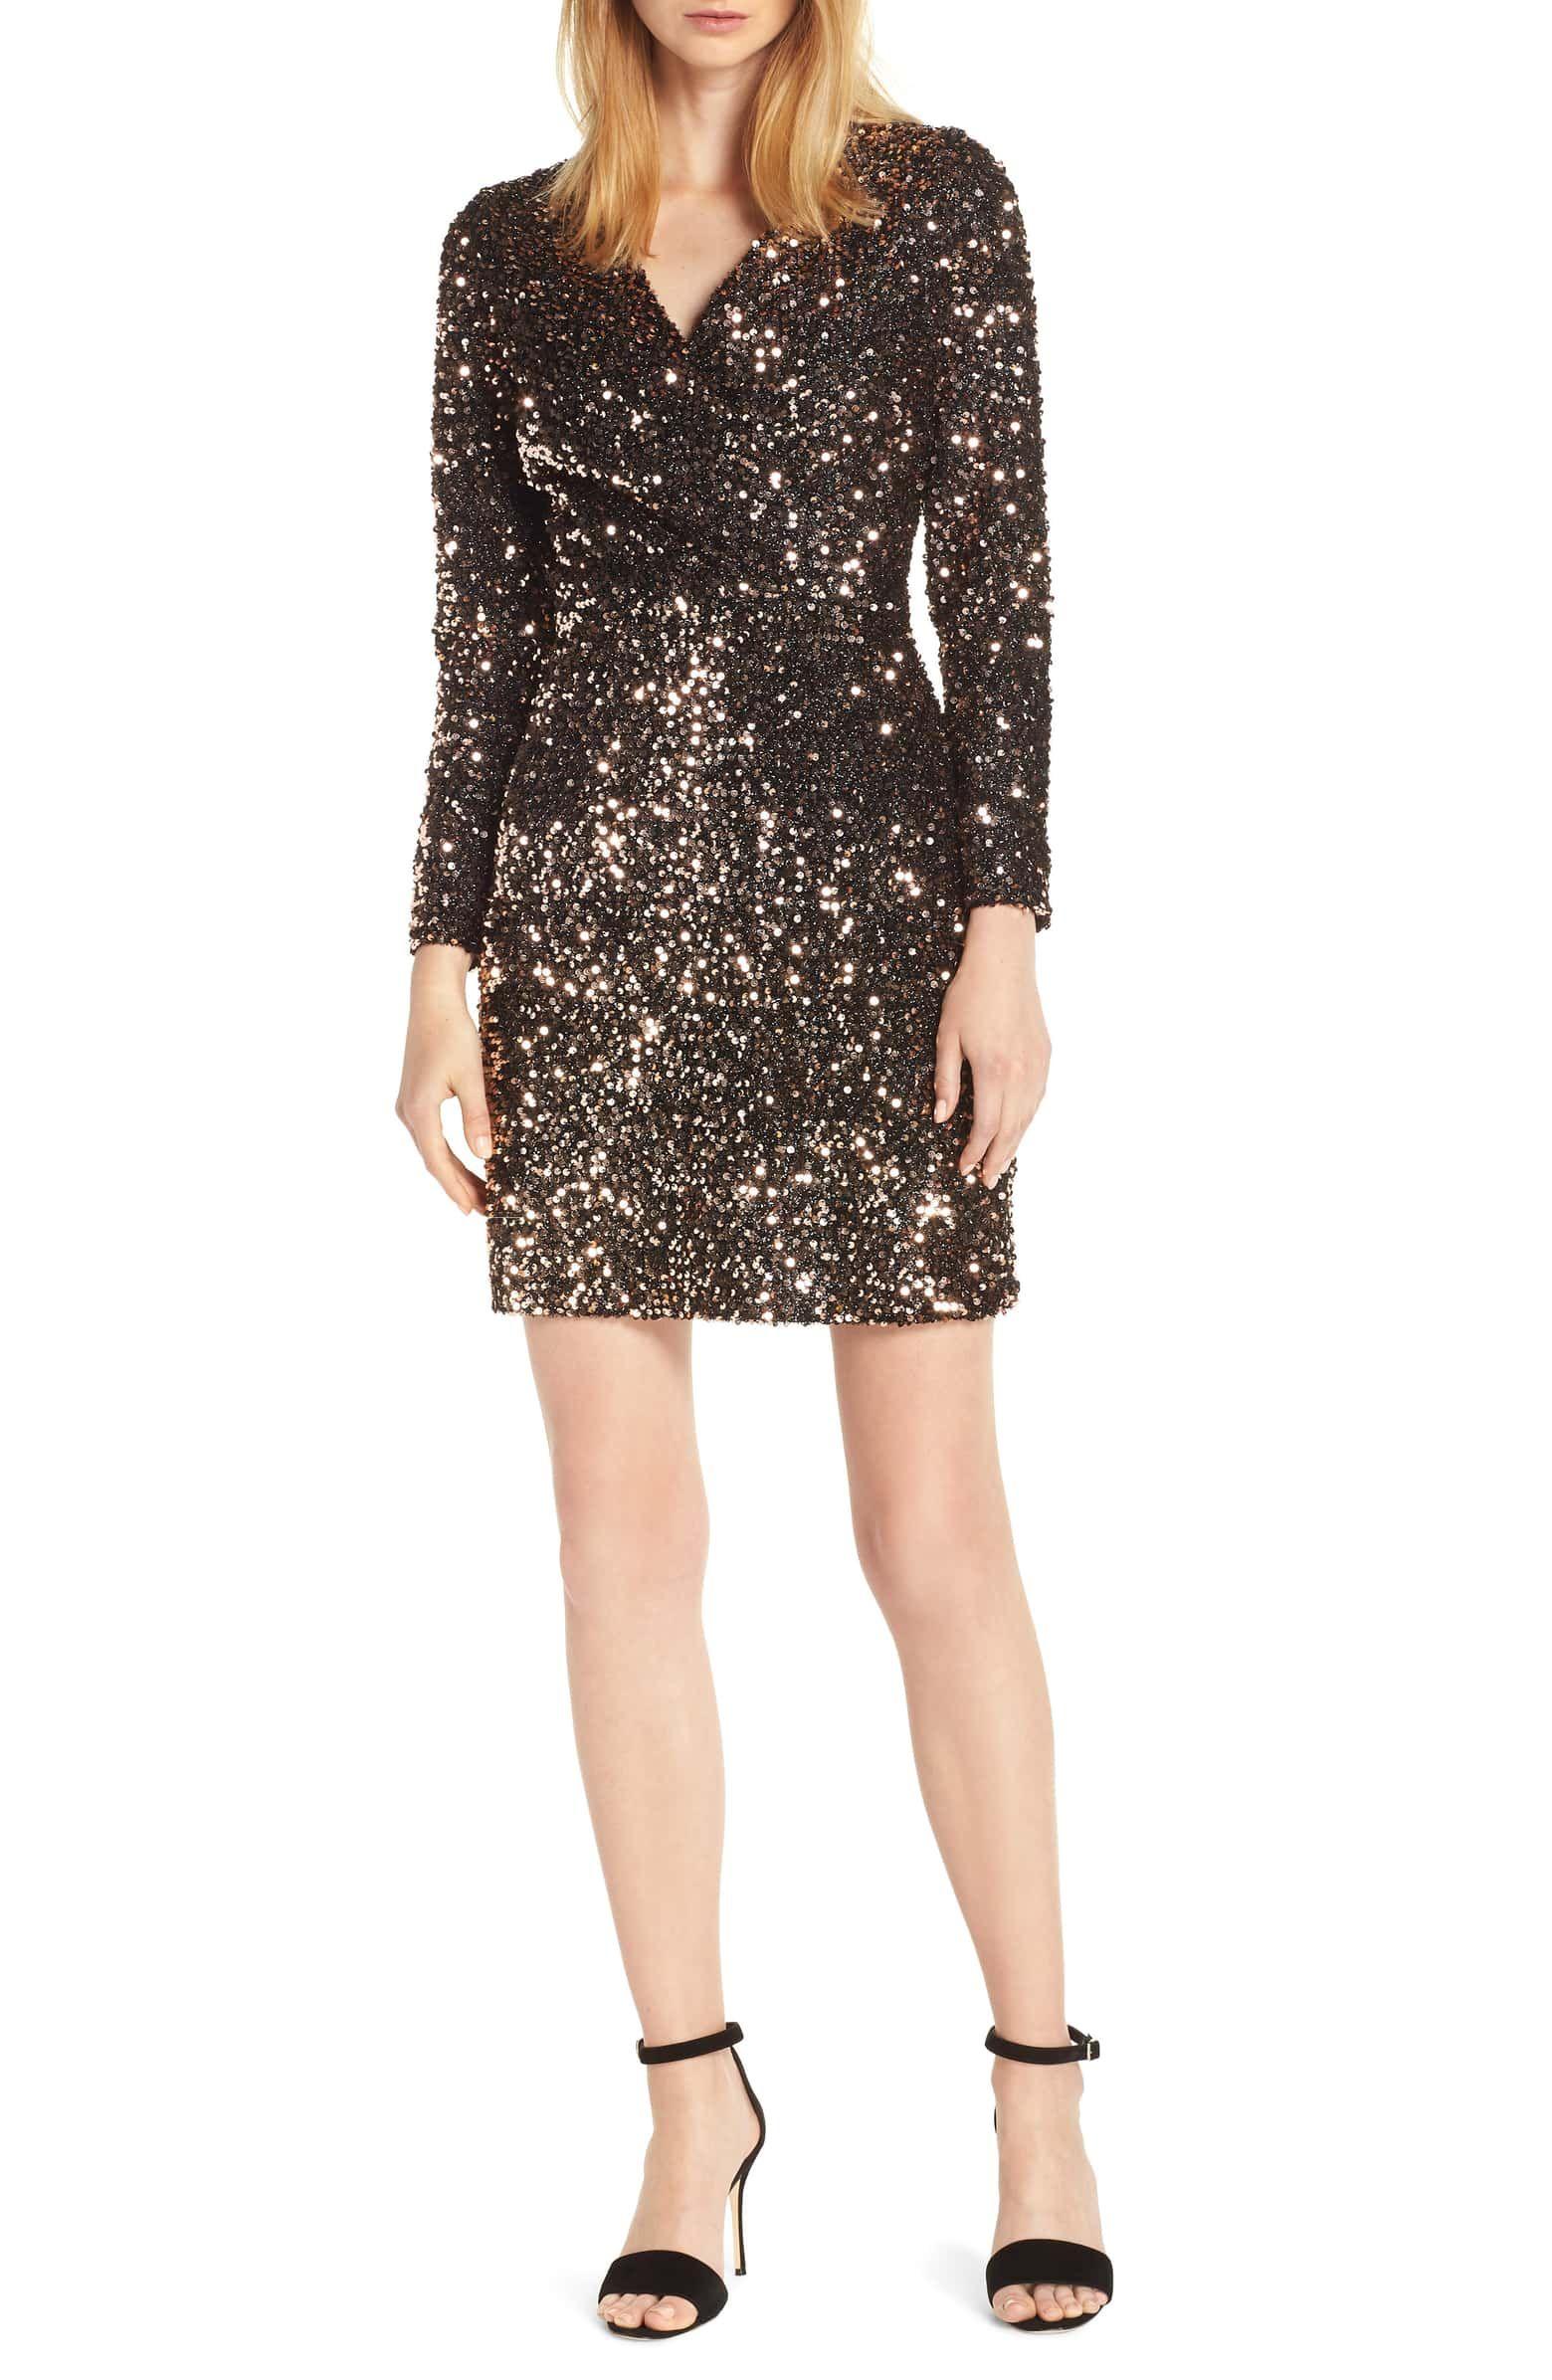 Sam Edelman Sequin Sheath Dress Nordstrom Sequin Sheath Dress Sheath Dress Nordstrom Dresses [ 2392 x 1560 Pixel ]